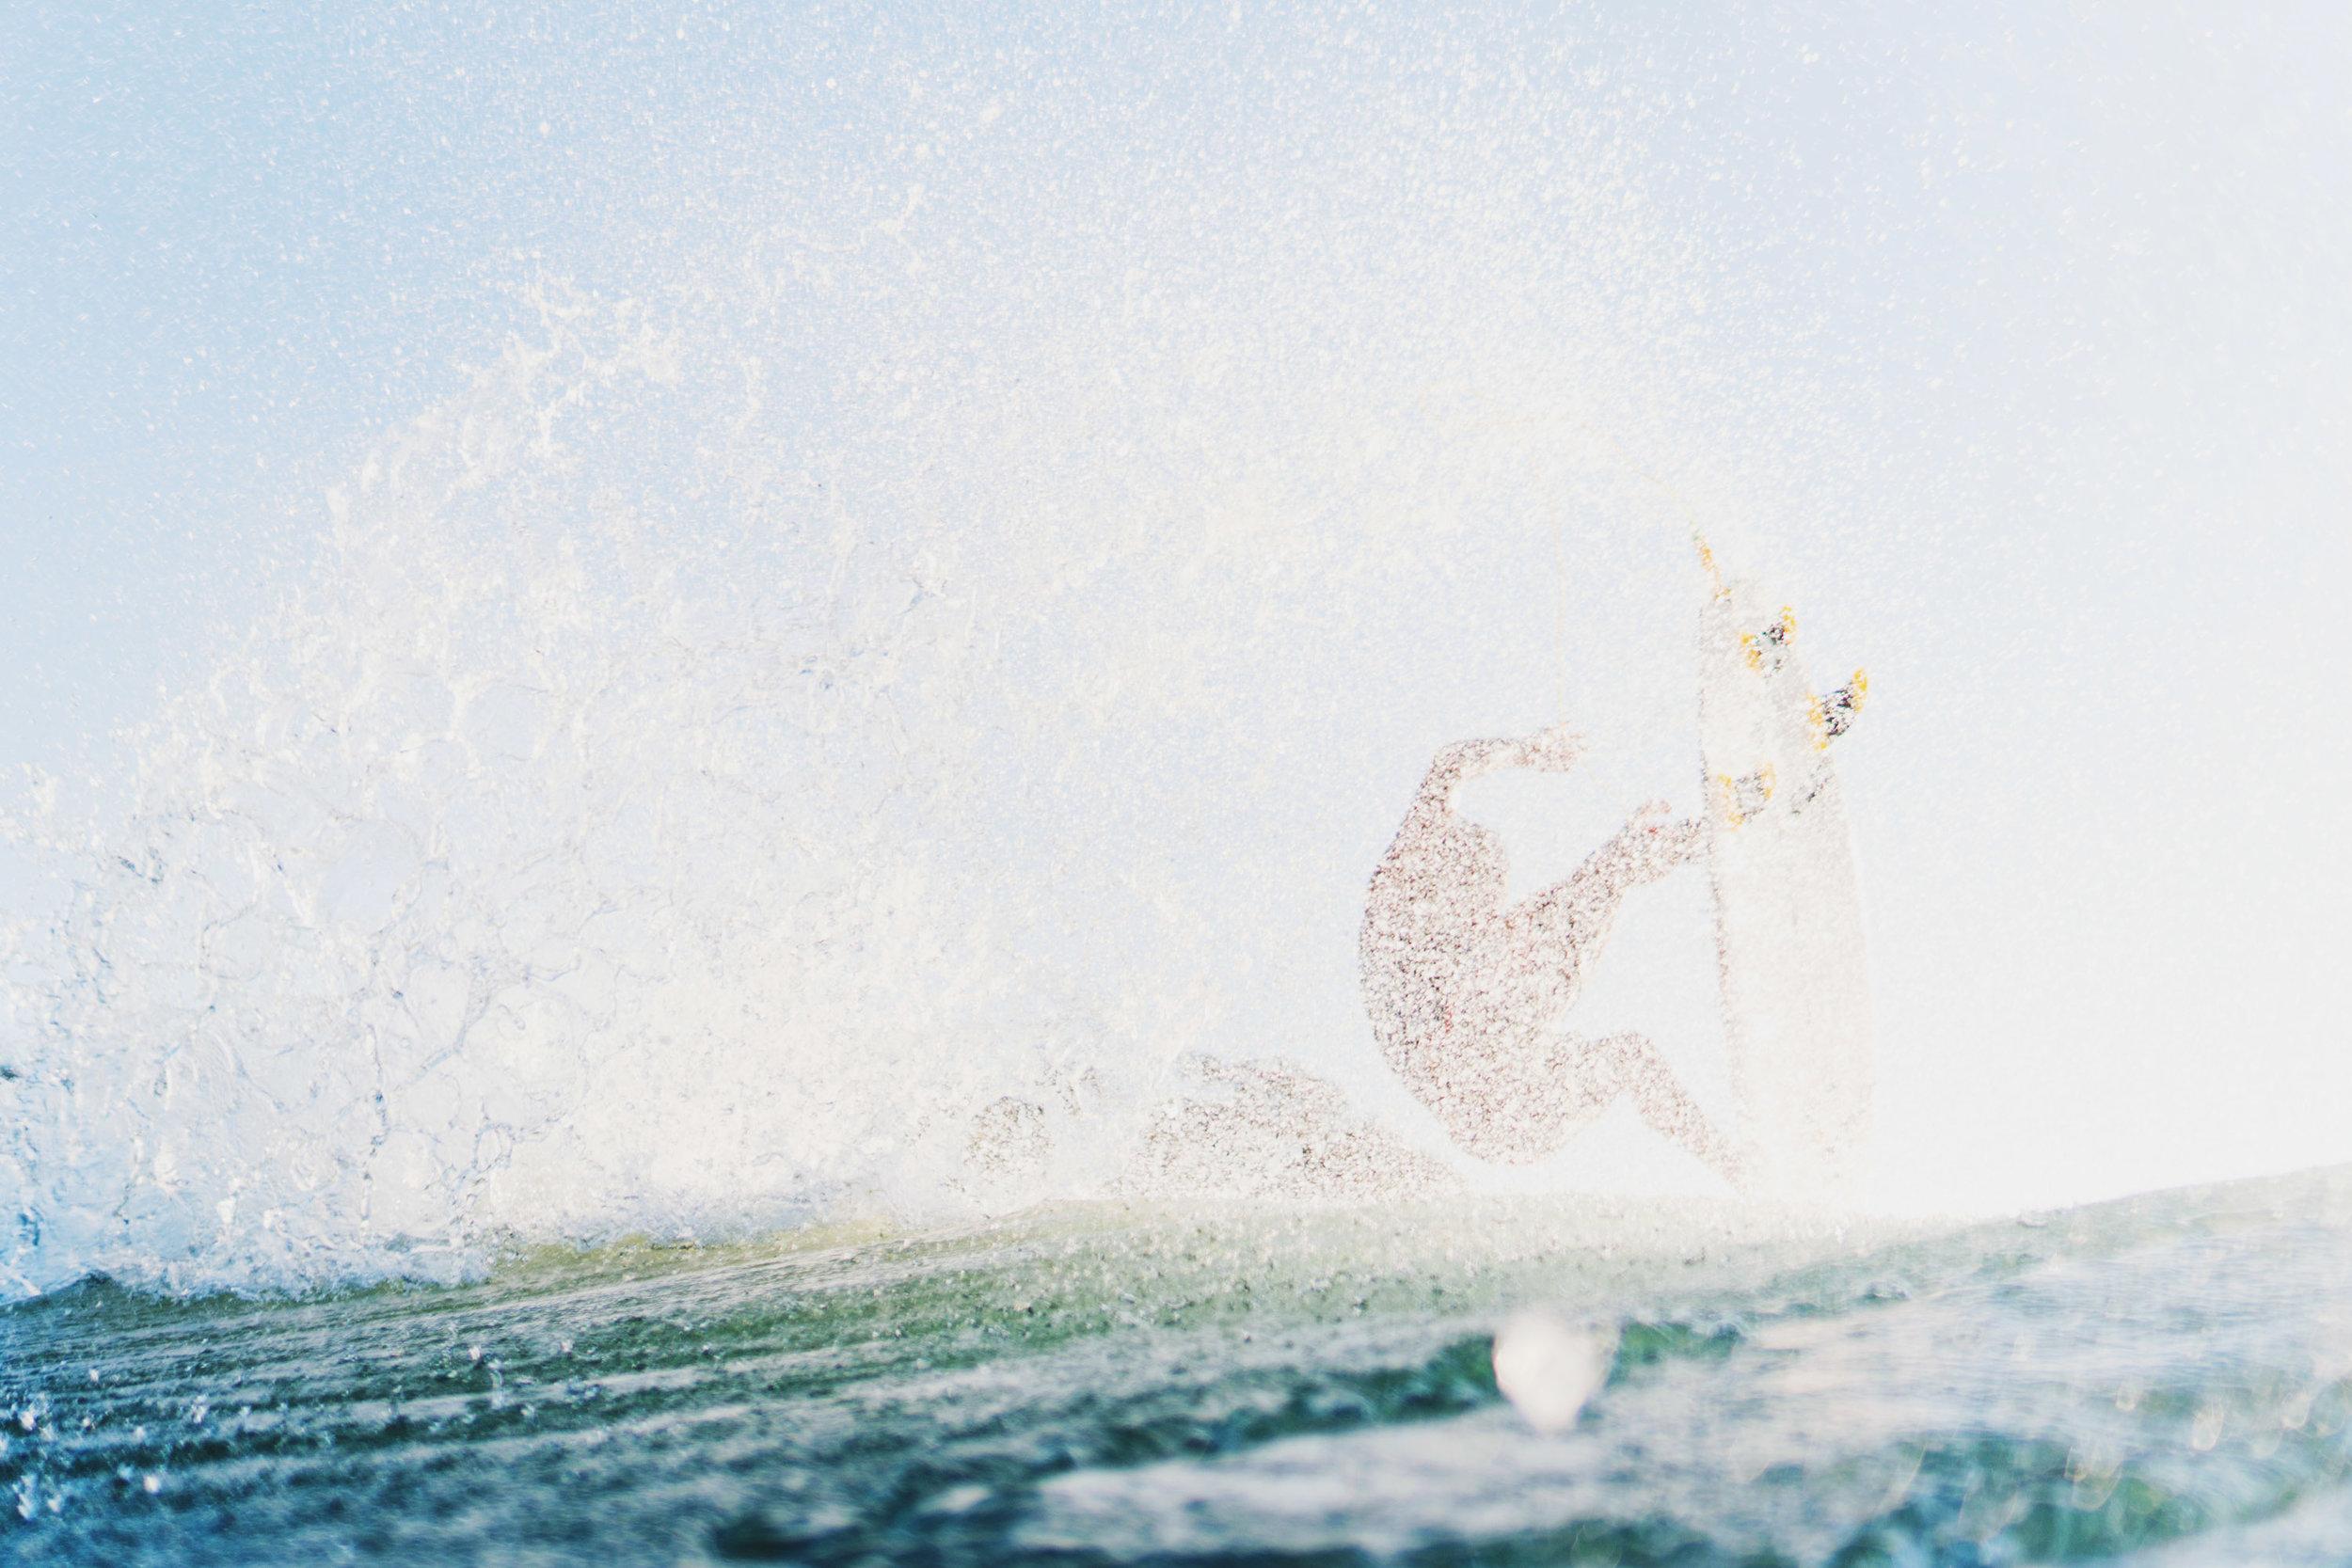 Surf-Mexico-Zihuatanejo-Sayulita-Ixtapa-Zihuatanejo-Diego-Cadena-Olas-Fotografia-Heiko-Bothe-61.jpg